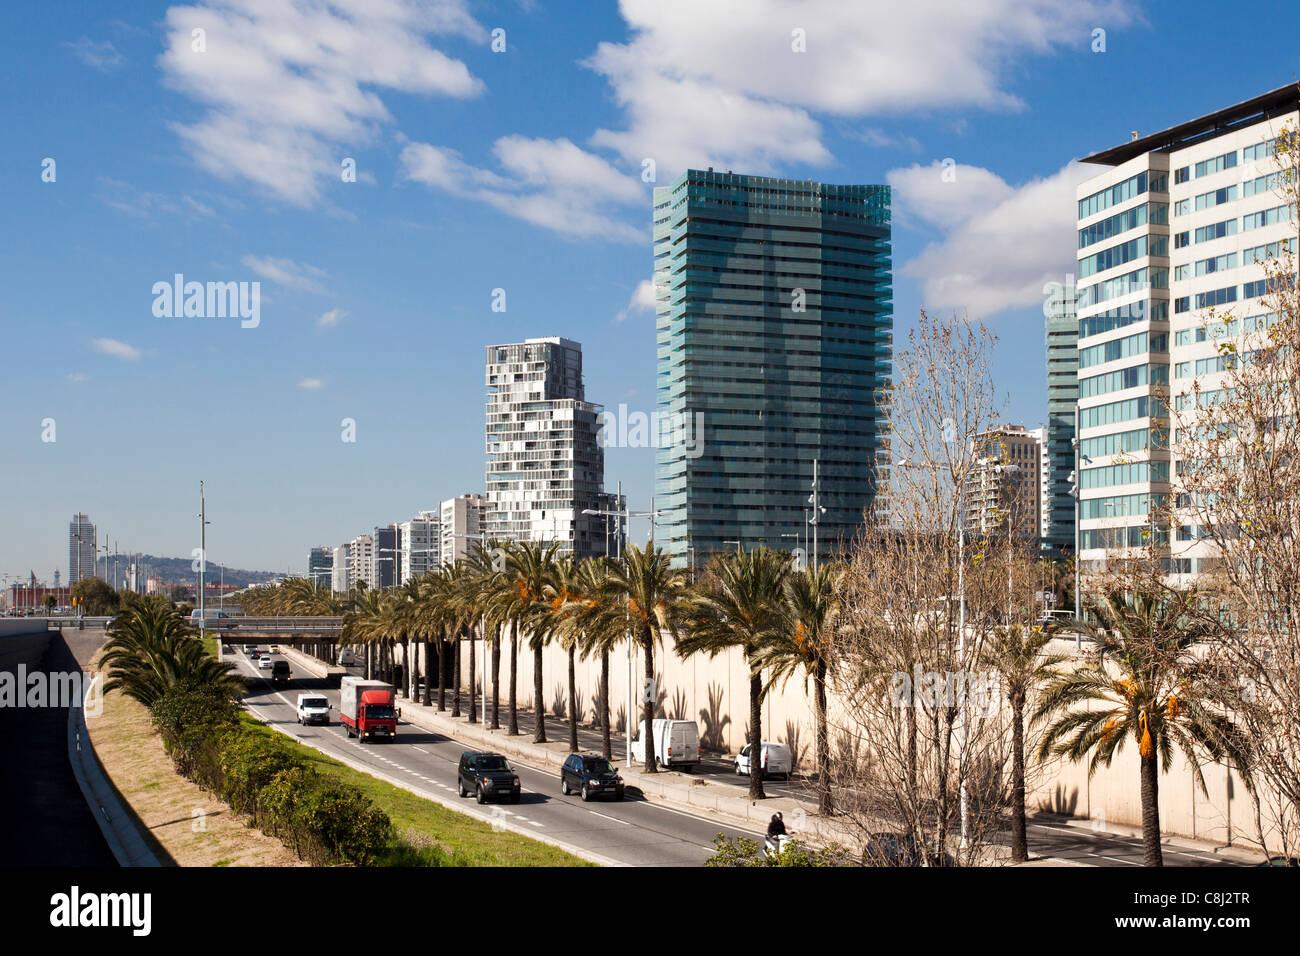 Catalunya, Barcelona, Spanien, Europa, Diagonal Mar, Uferpromenade, Ronda Litoral Stockbild